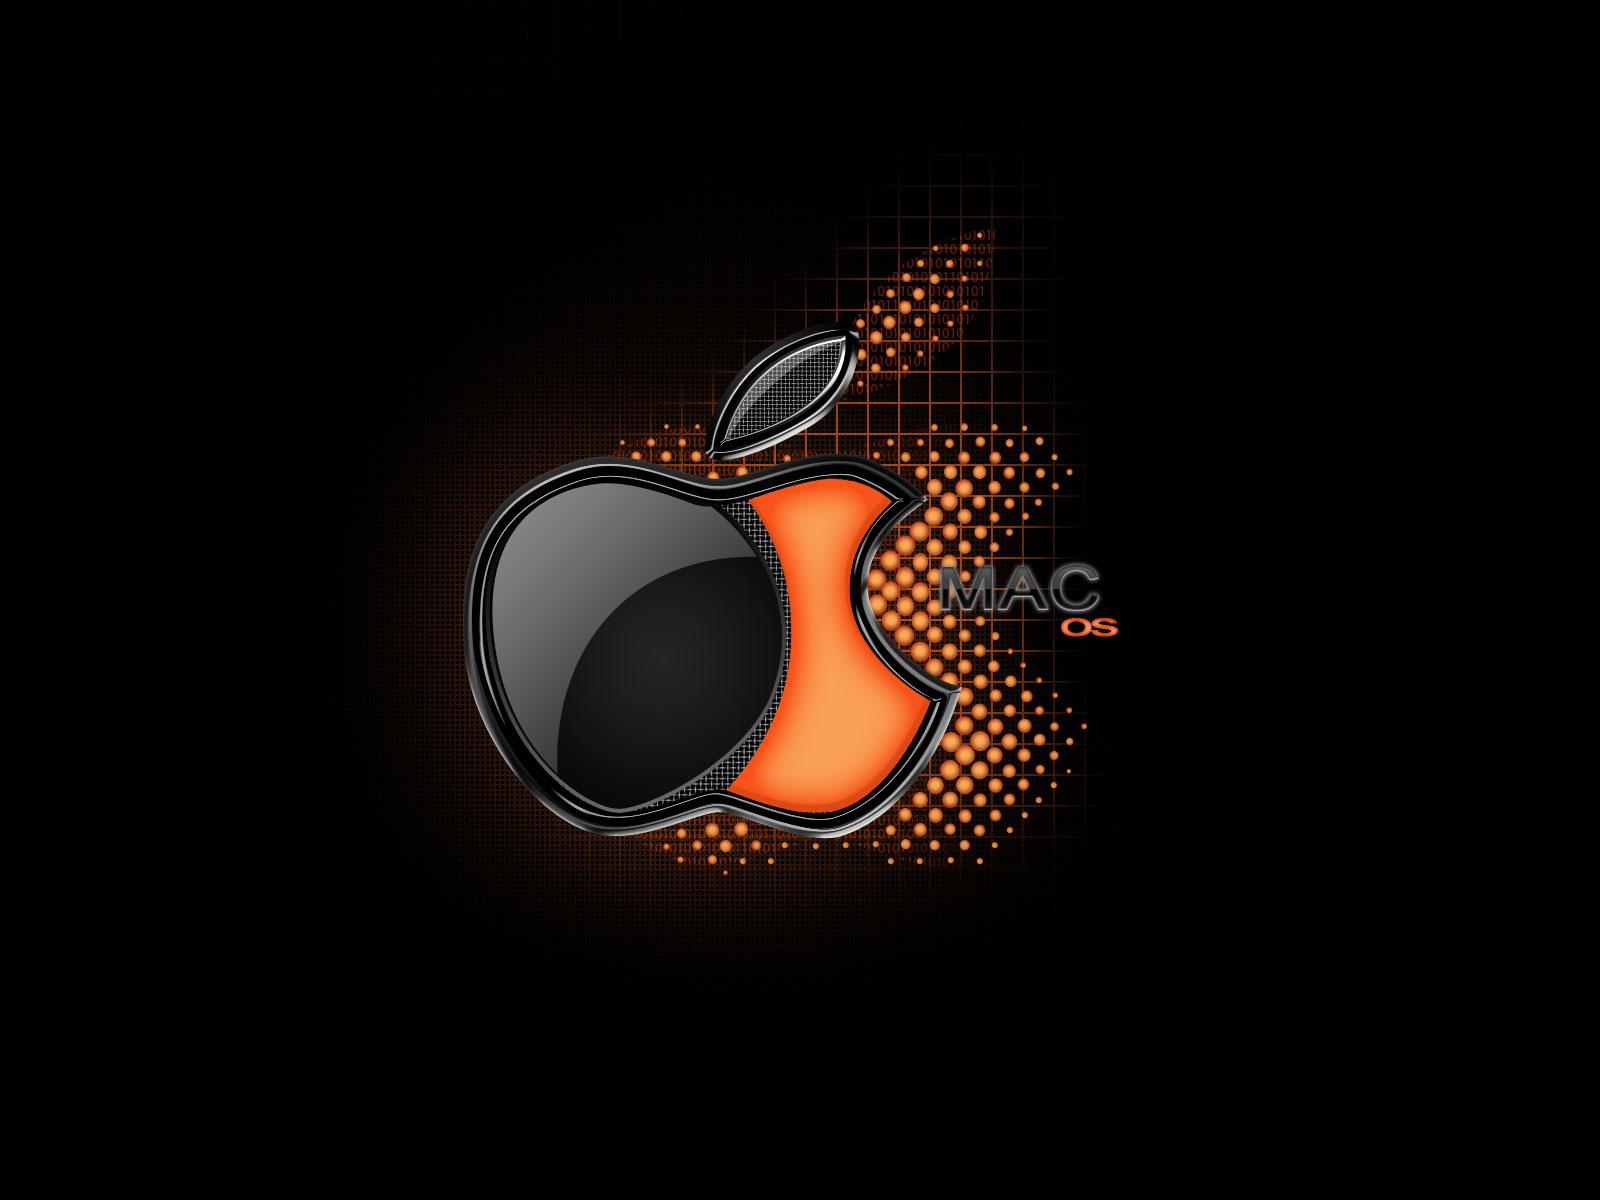 http://2.bp.blogspot.com/-xufmZc1-Blg/Tff6ilMinII/AAAAAAAAClE/EN42HHF2hkw/s1600/Mac-OS-X-wallpaper.jpg